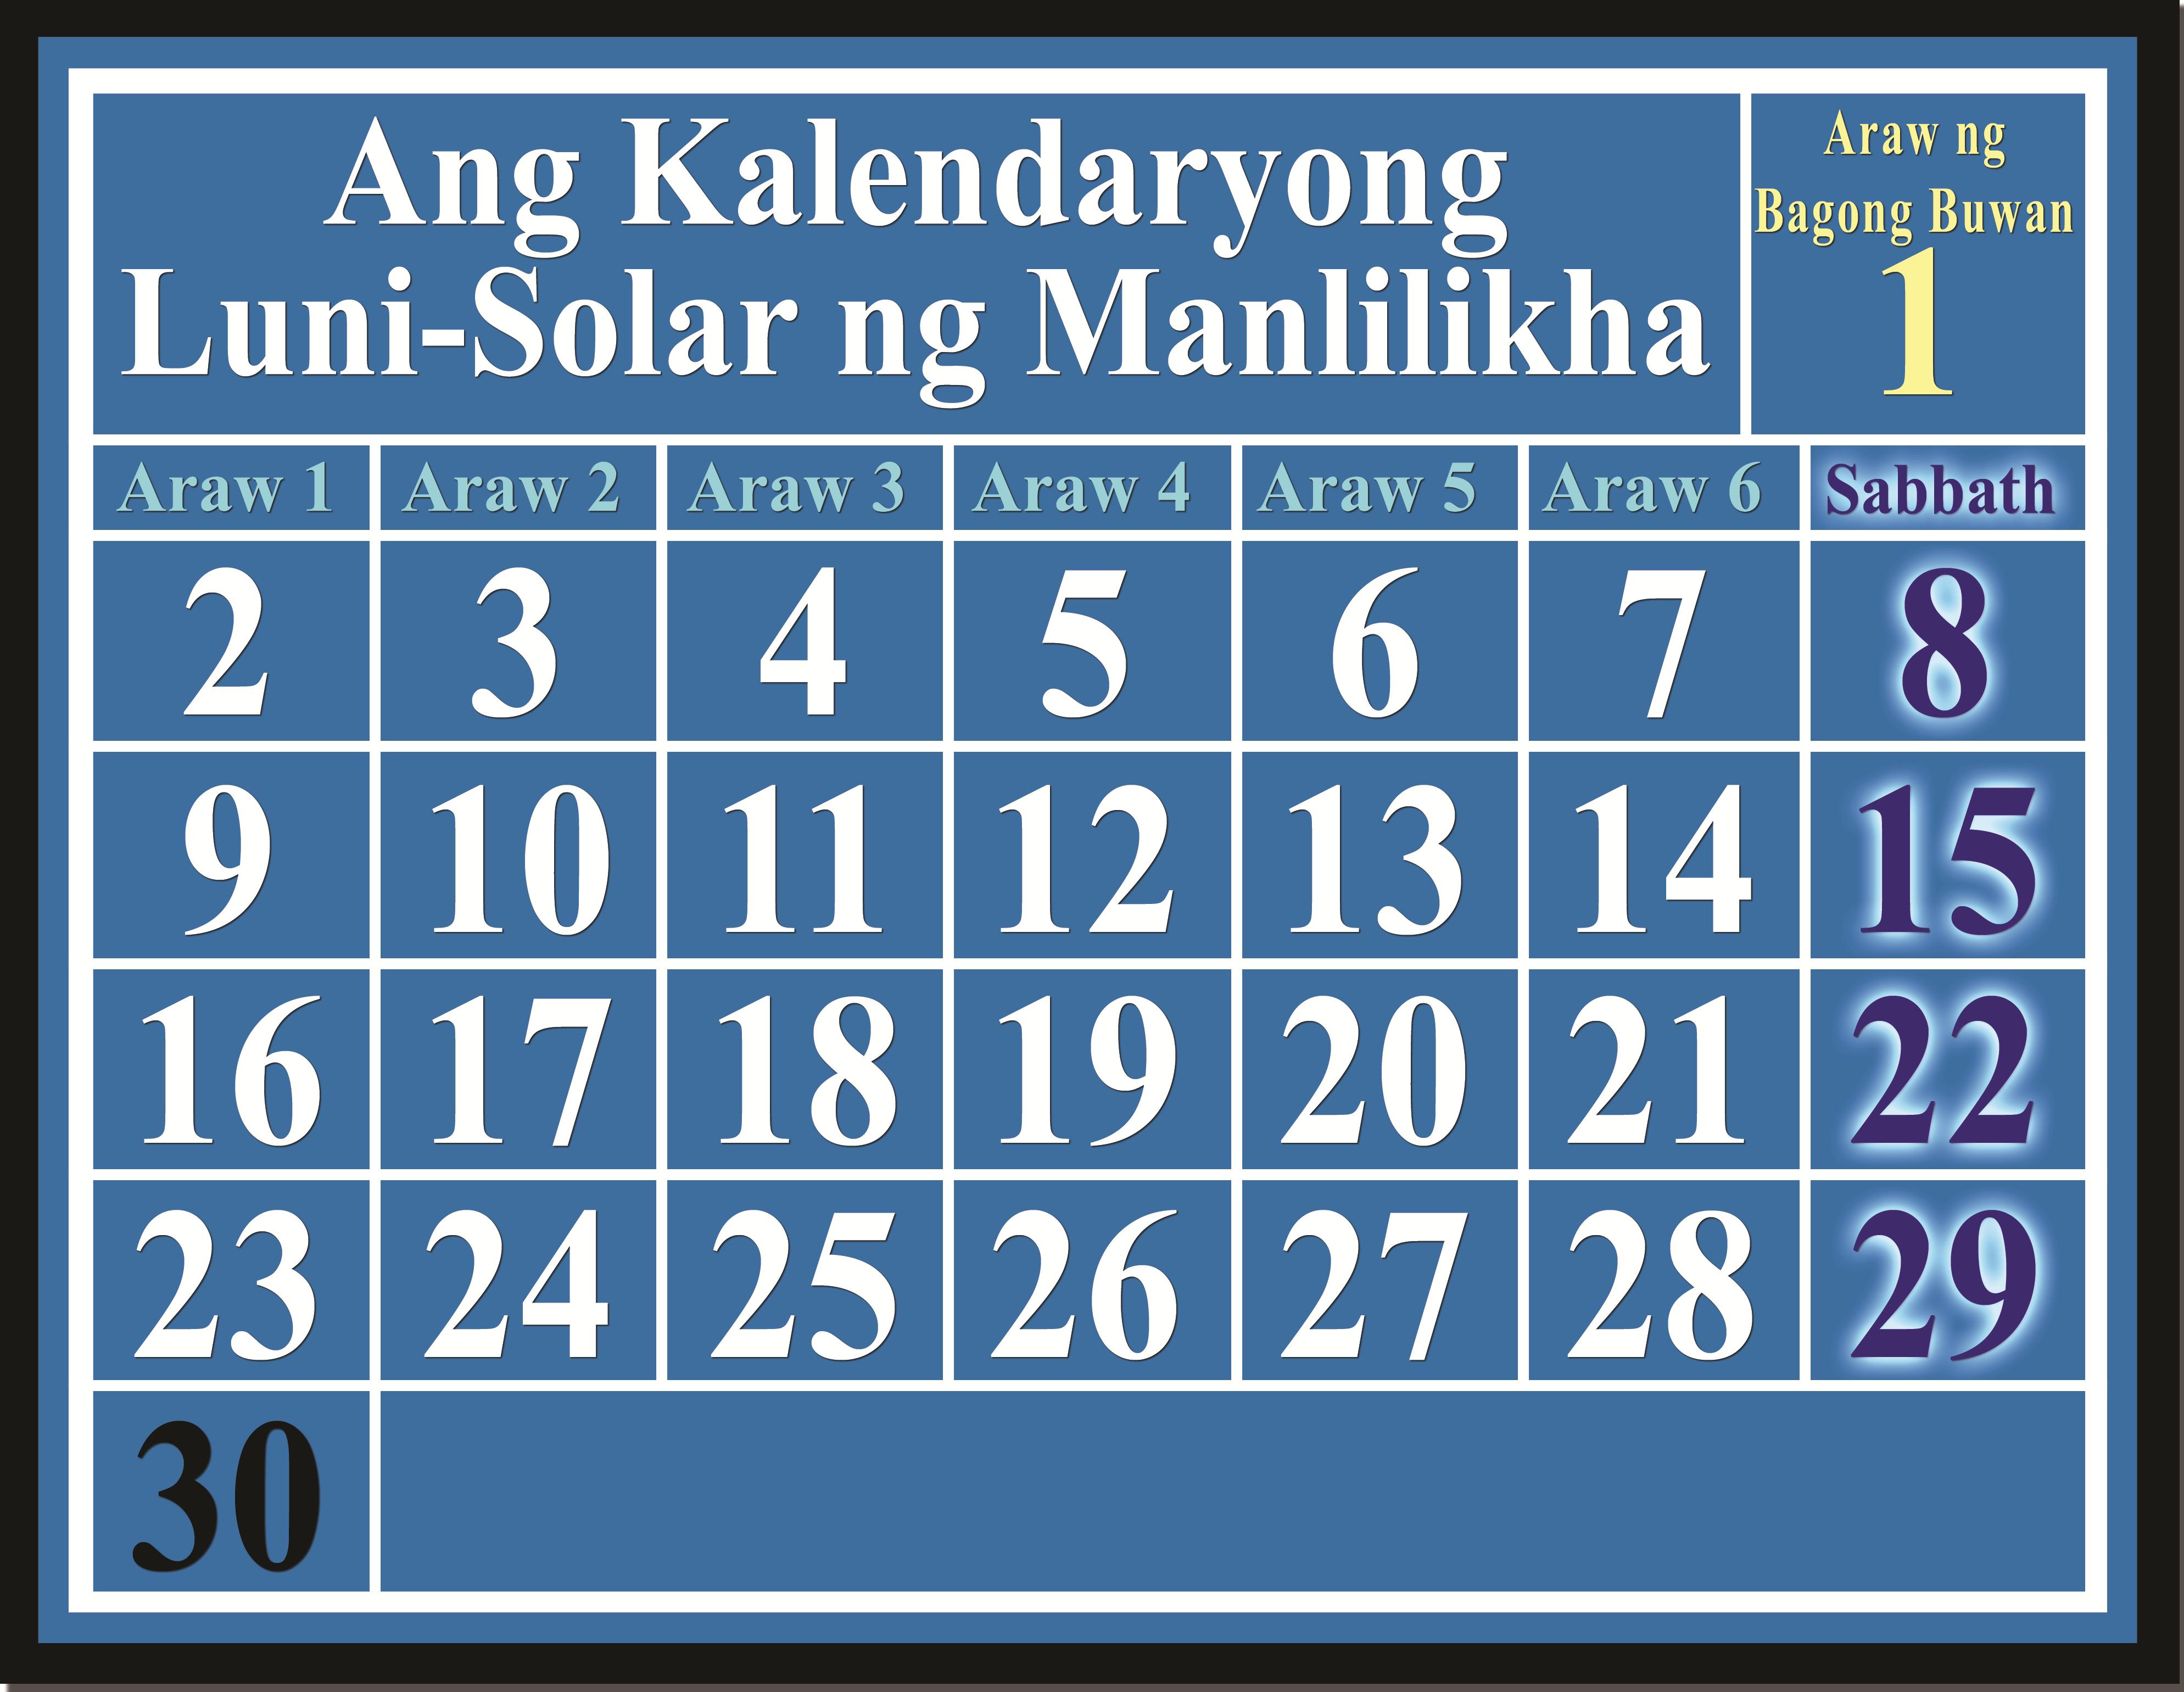 kalendaryong luni-solar – nagkakalkula sa lunar sabbath